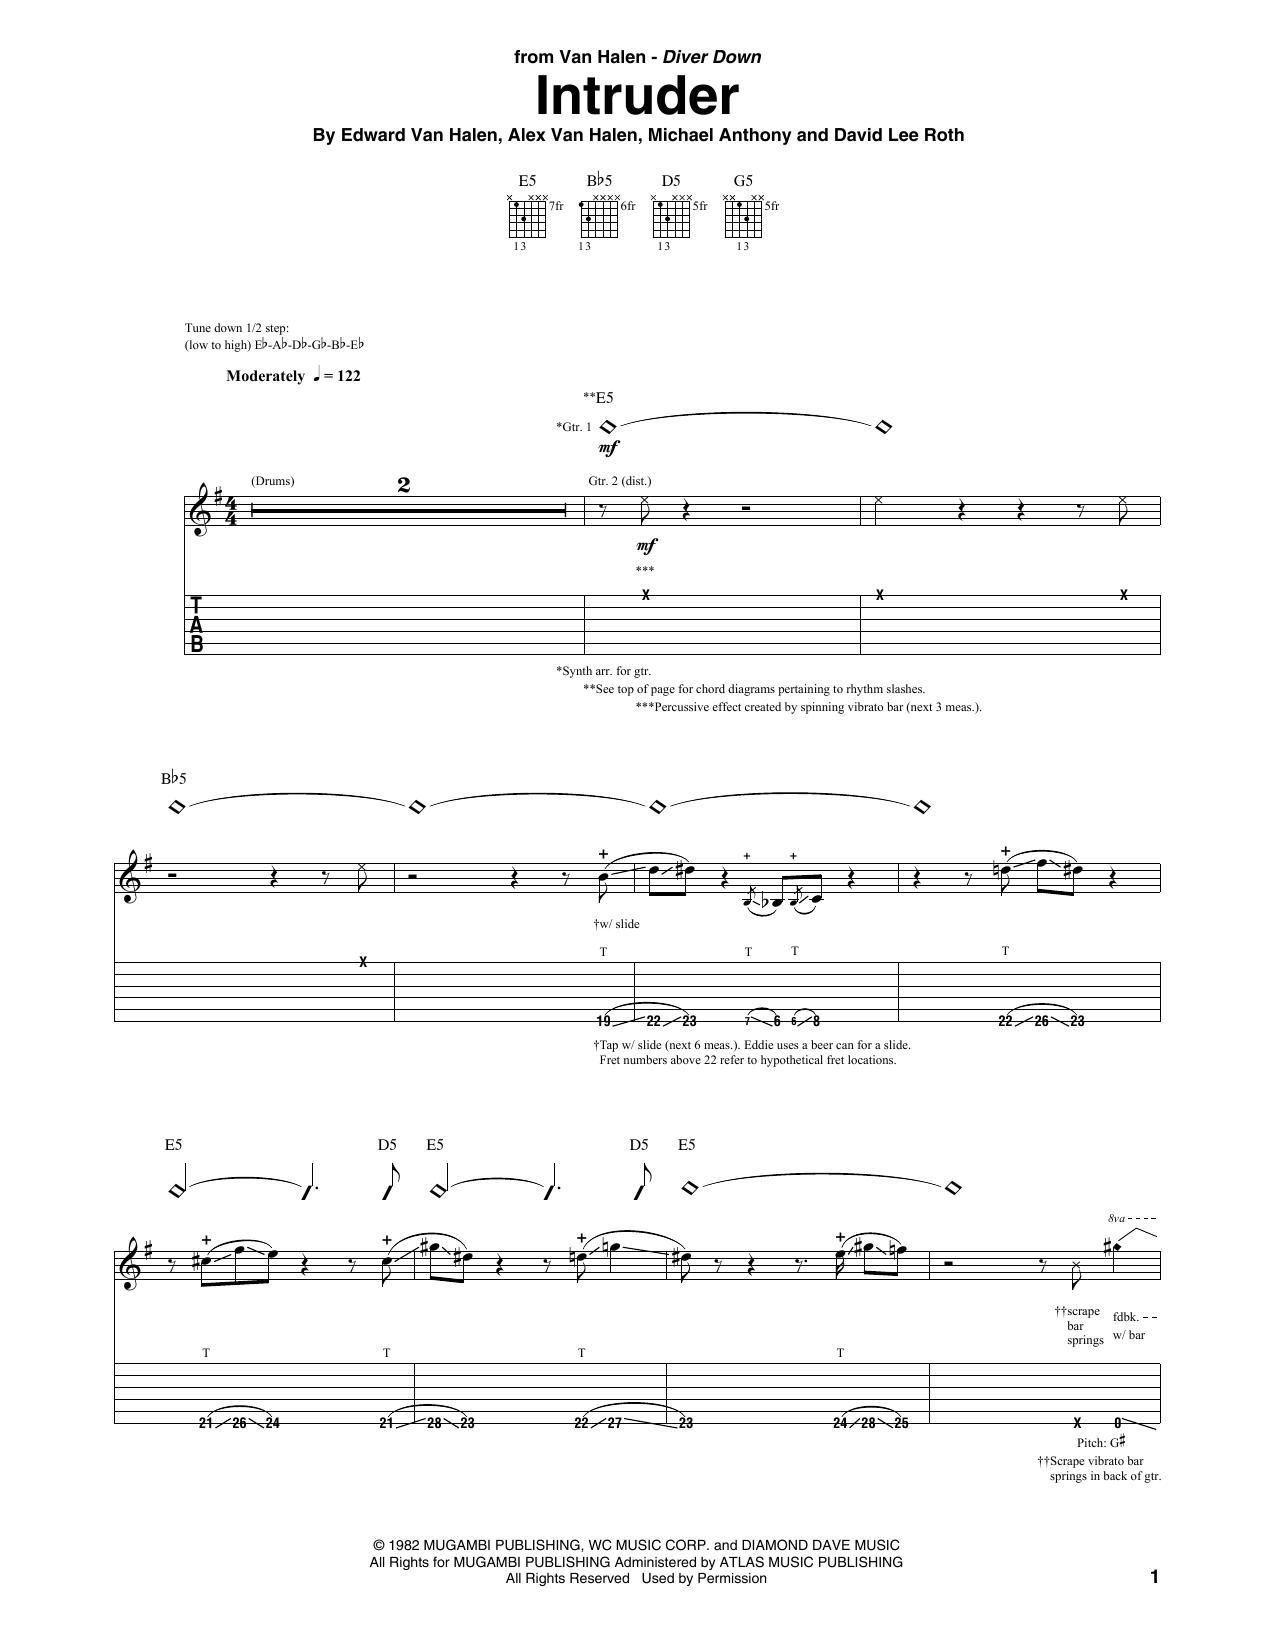 Van Halen Intruder sheet music notes and chords. Download Printable PDF.